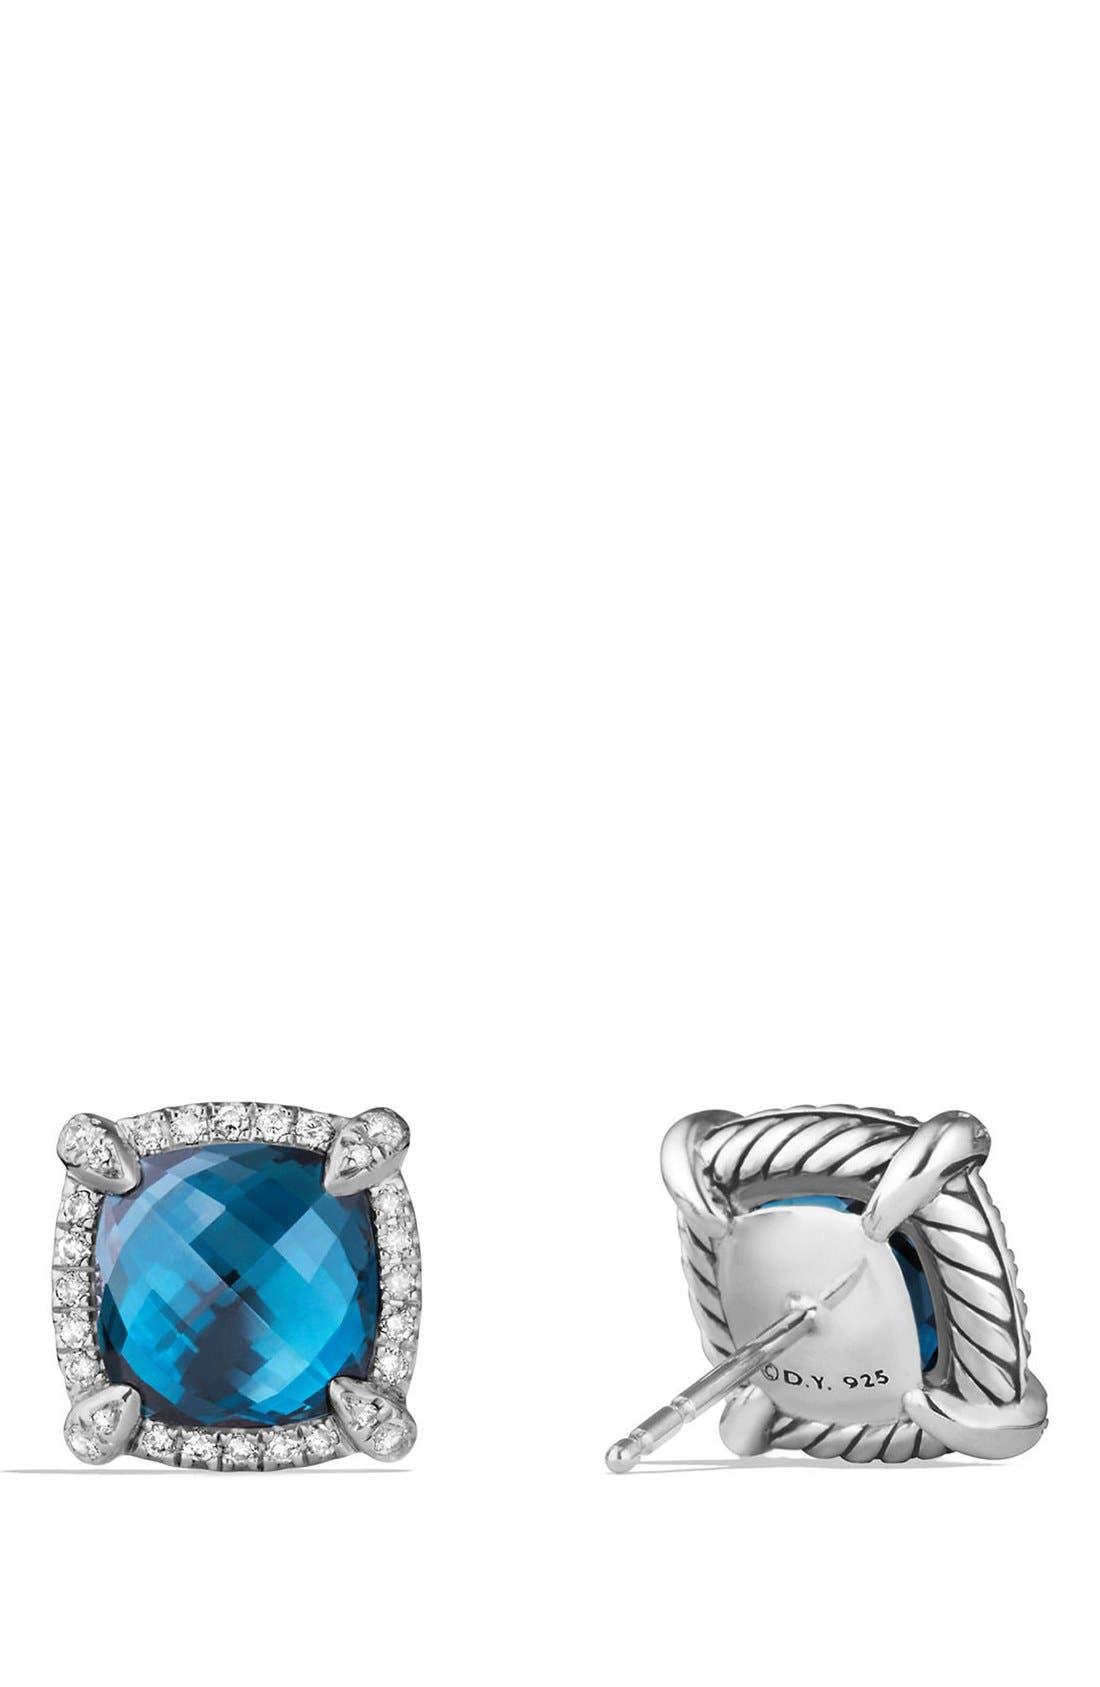 'Châtelaine' Pavé Bezel Stud Earrings with Diamonds,                             Alternate thumbnail 2, color,                             Blue Topaz